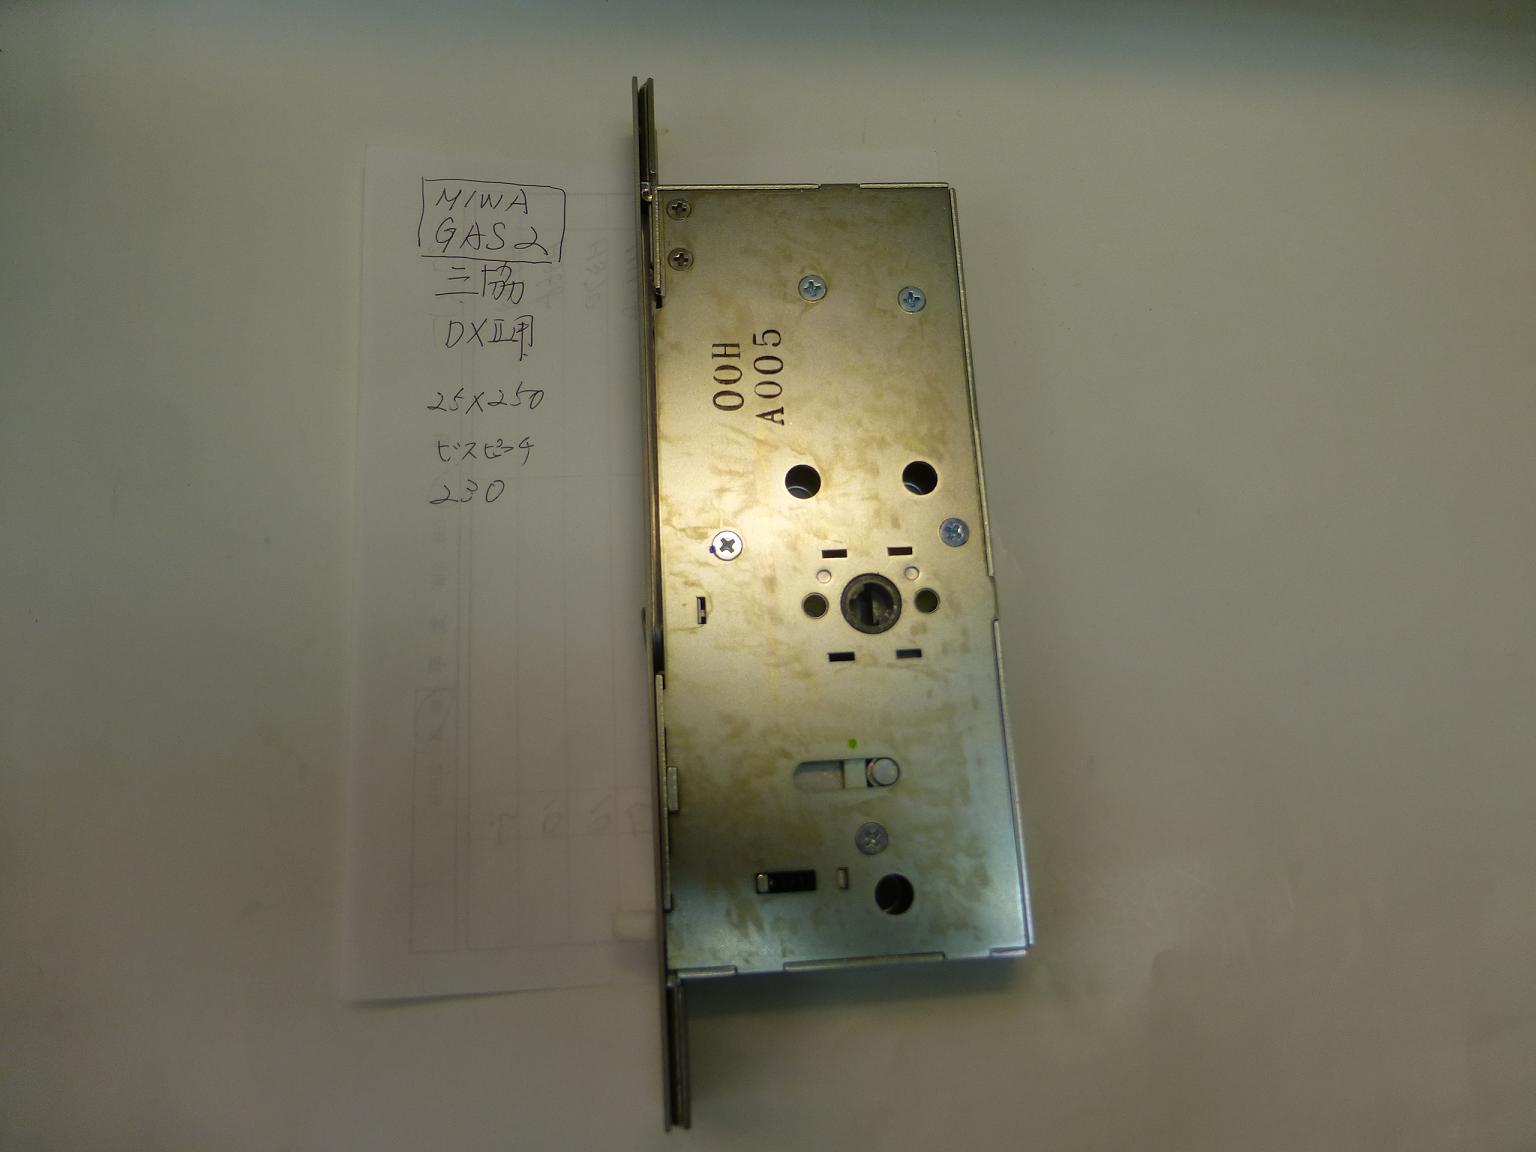 MIWA GAS2 B/S51mm フロント240X25ビスピッチ230 三協 DX-2 PH3561